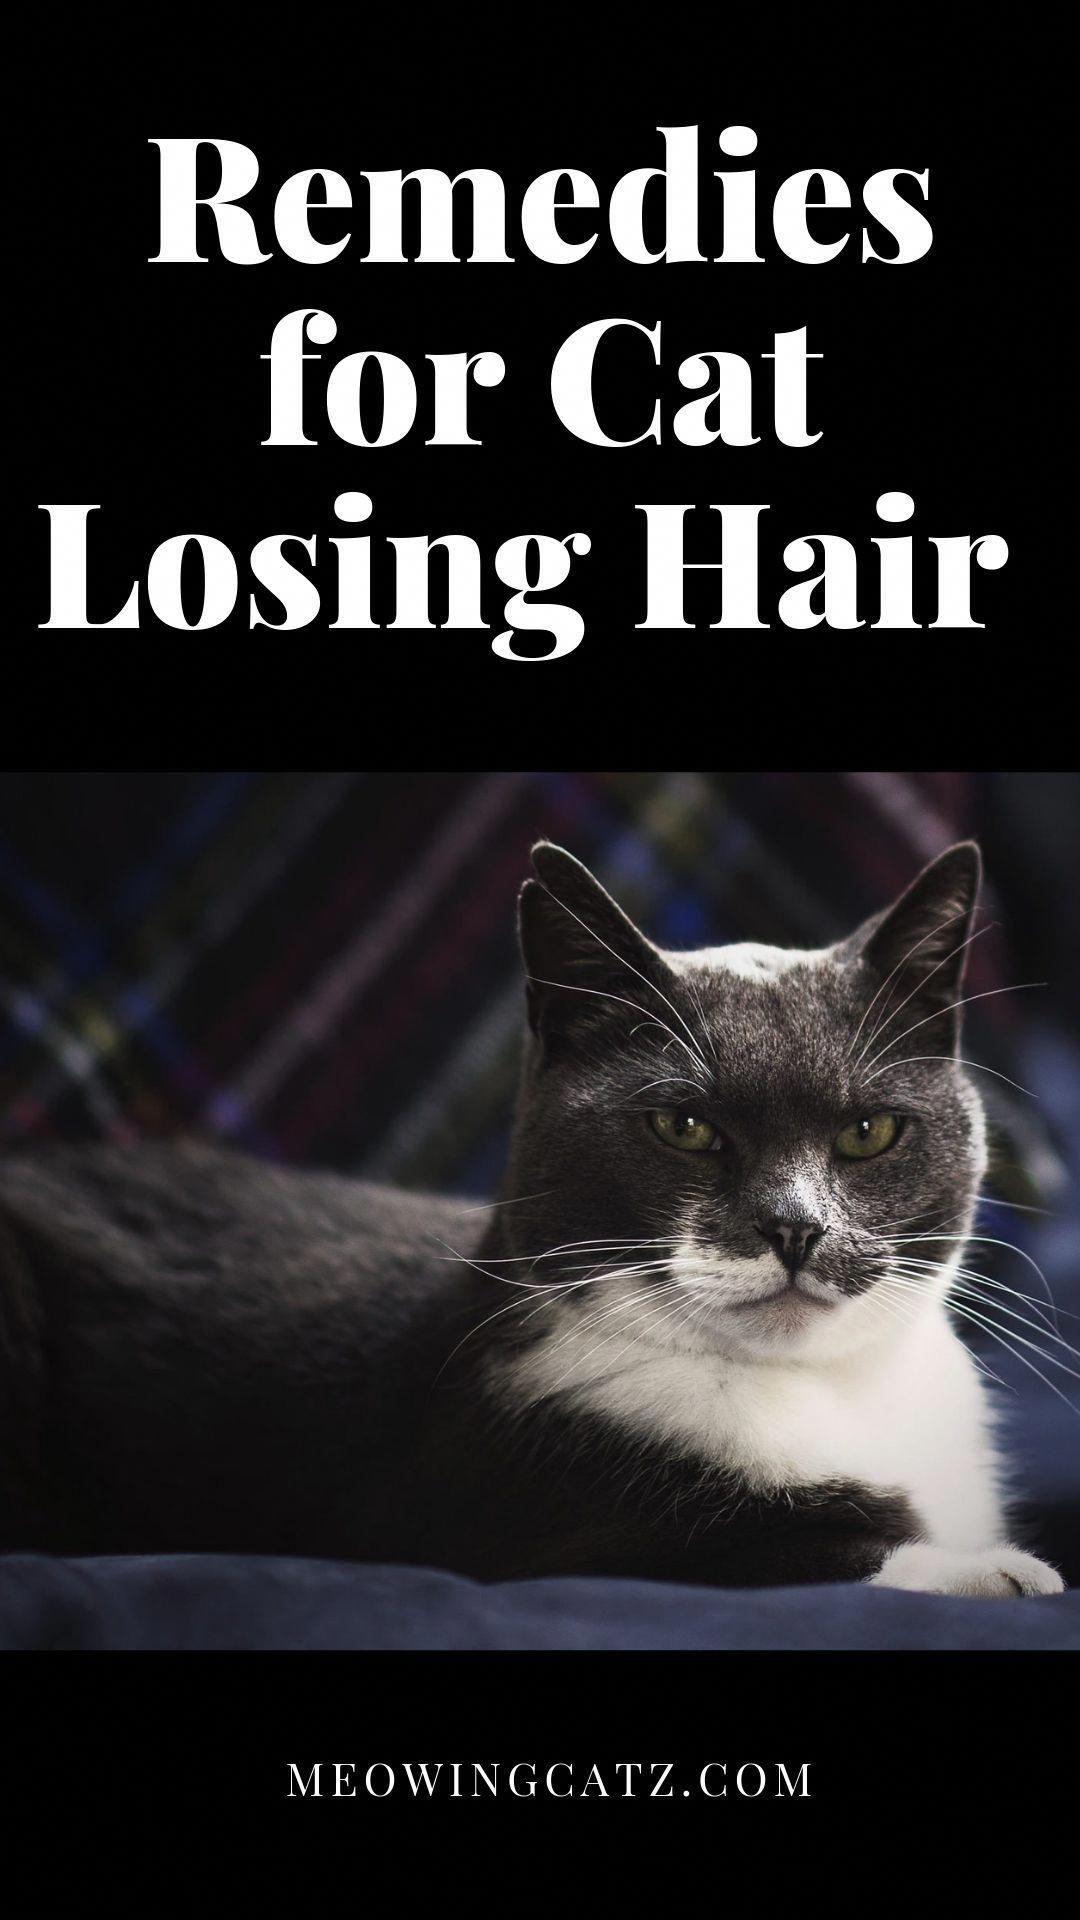 Remedies For Cat Losing Hair In 2020 Cat Hair Loss Lost Hair Hair Loss Treatment